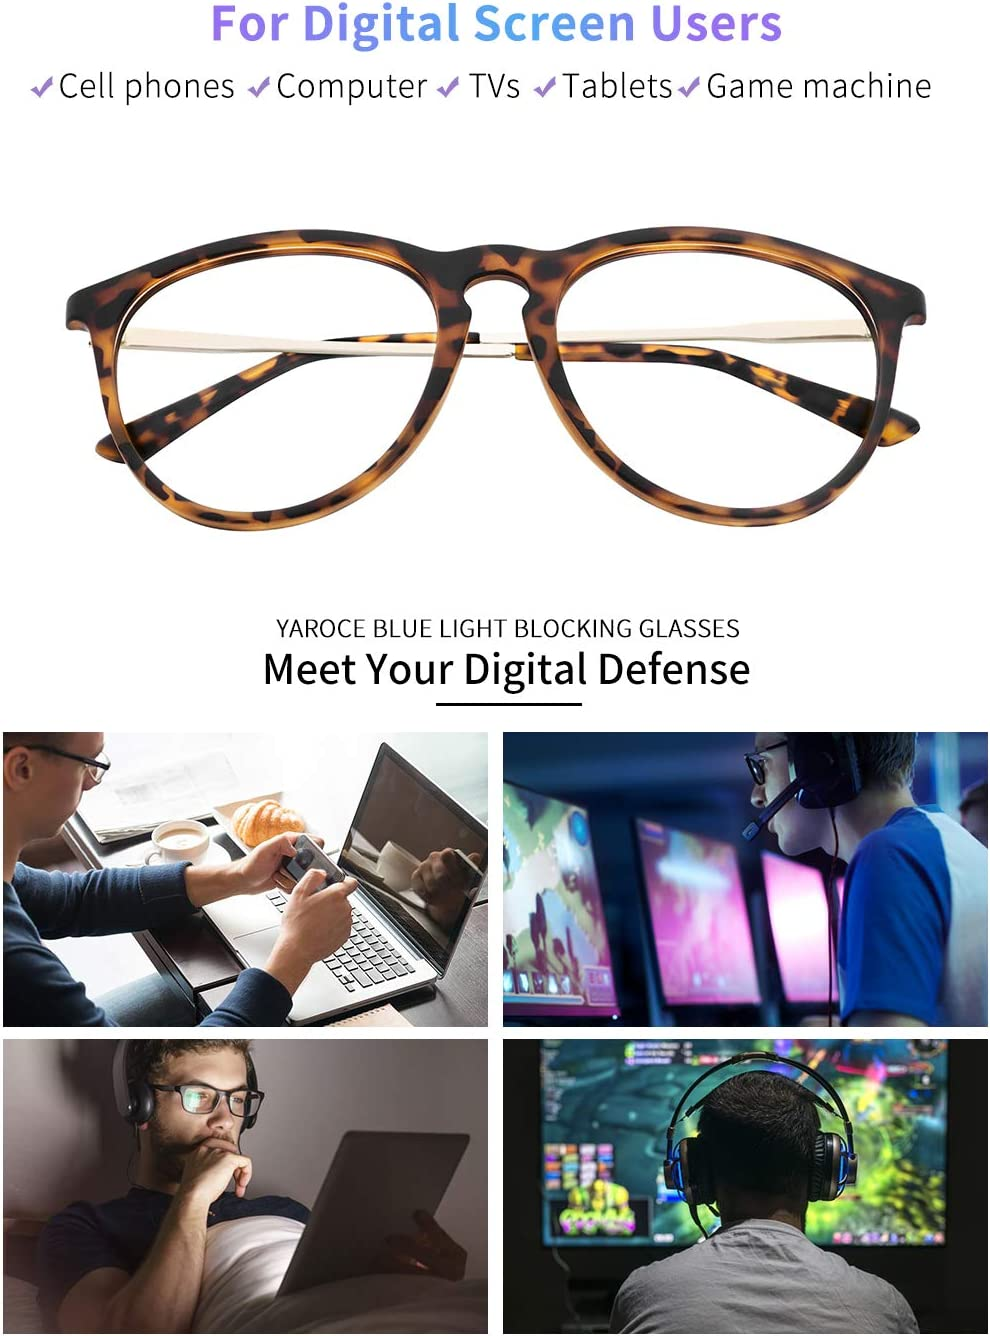 Yaroce Blue light glasses fit guide